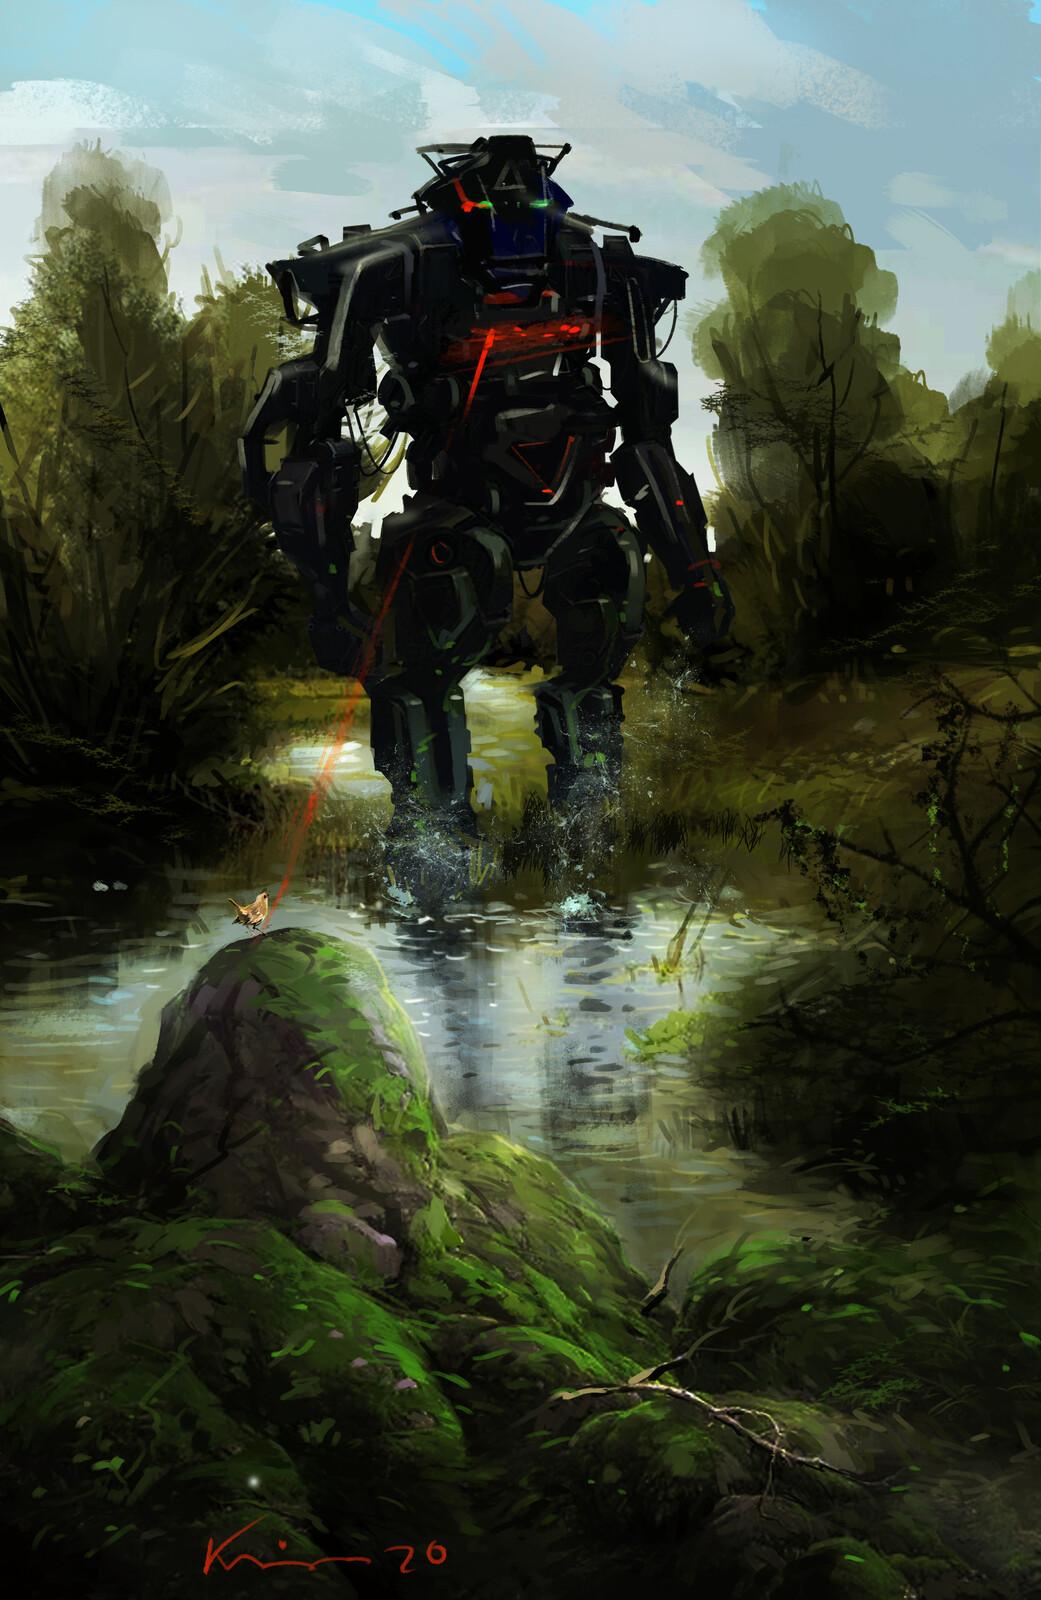 robot on nature ...